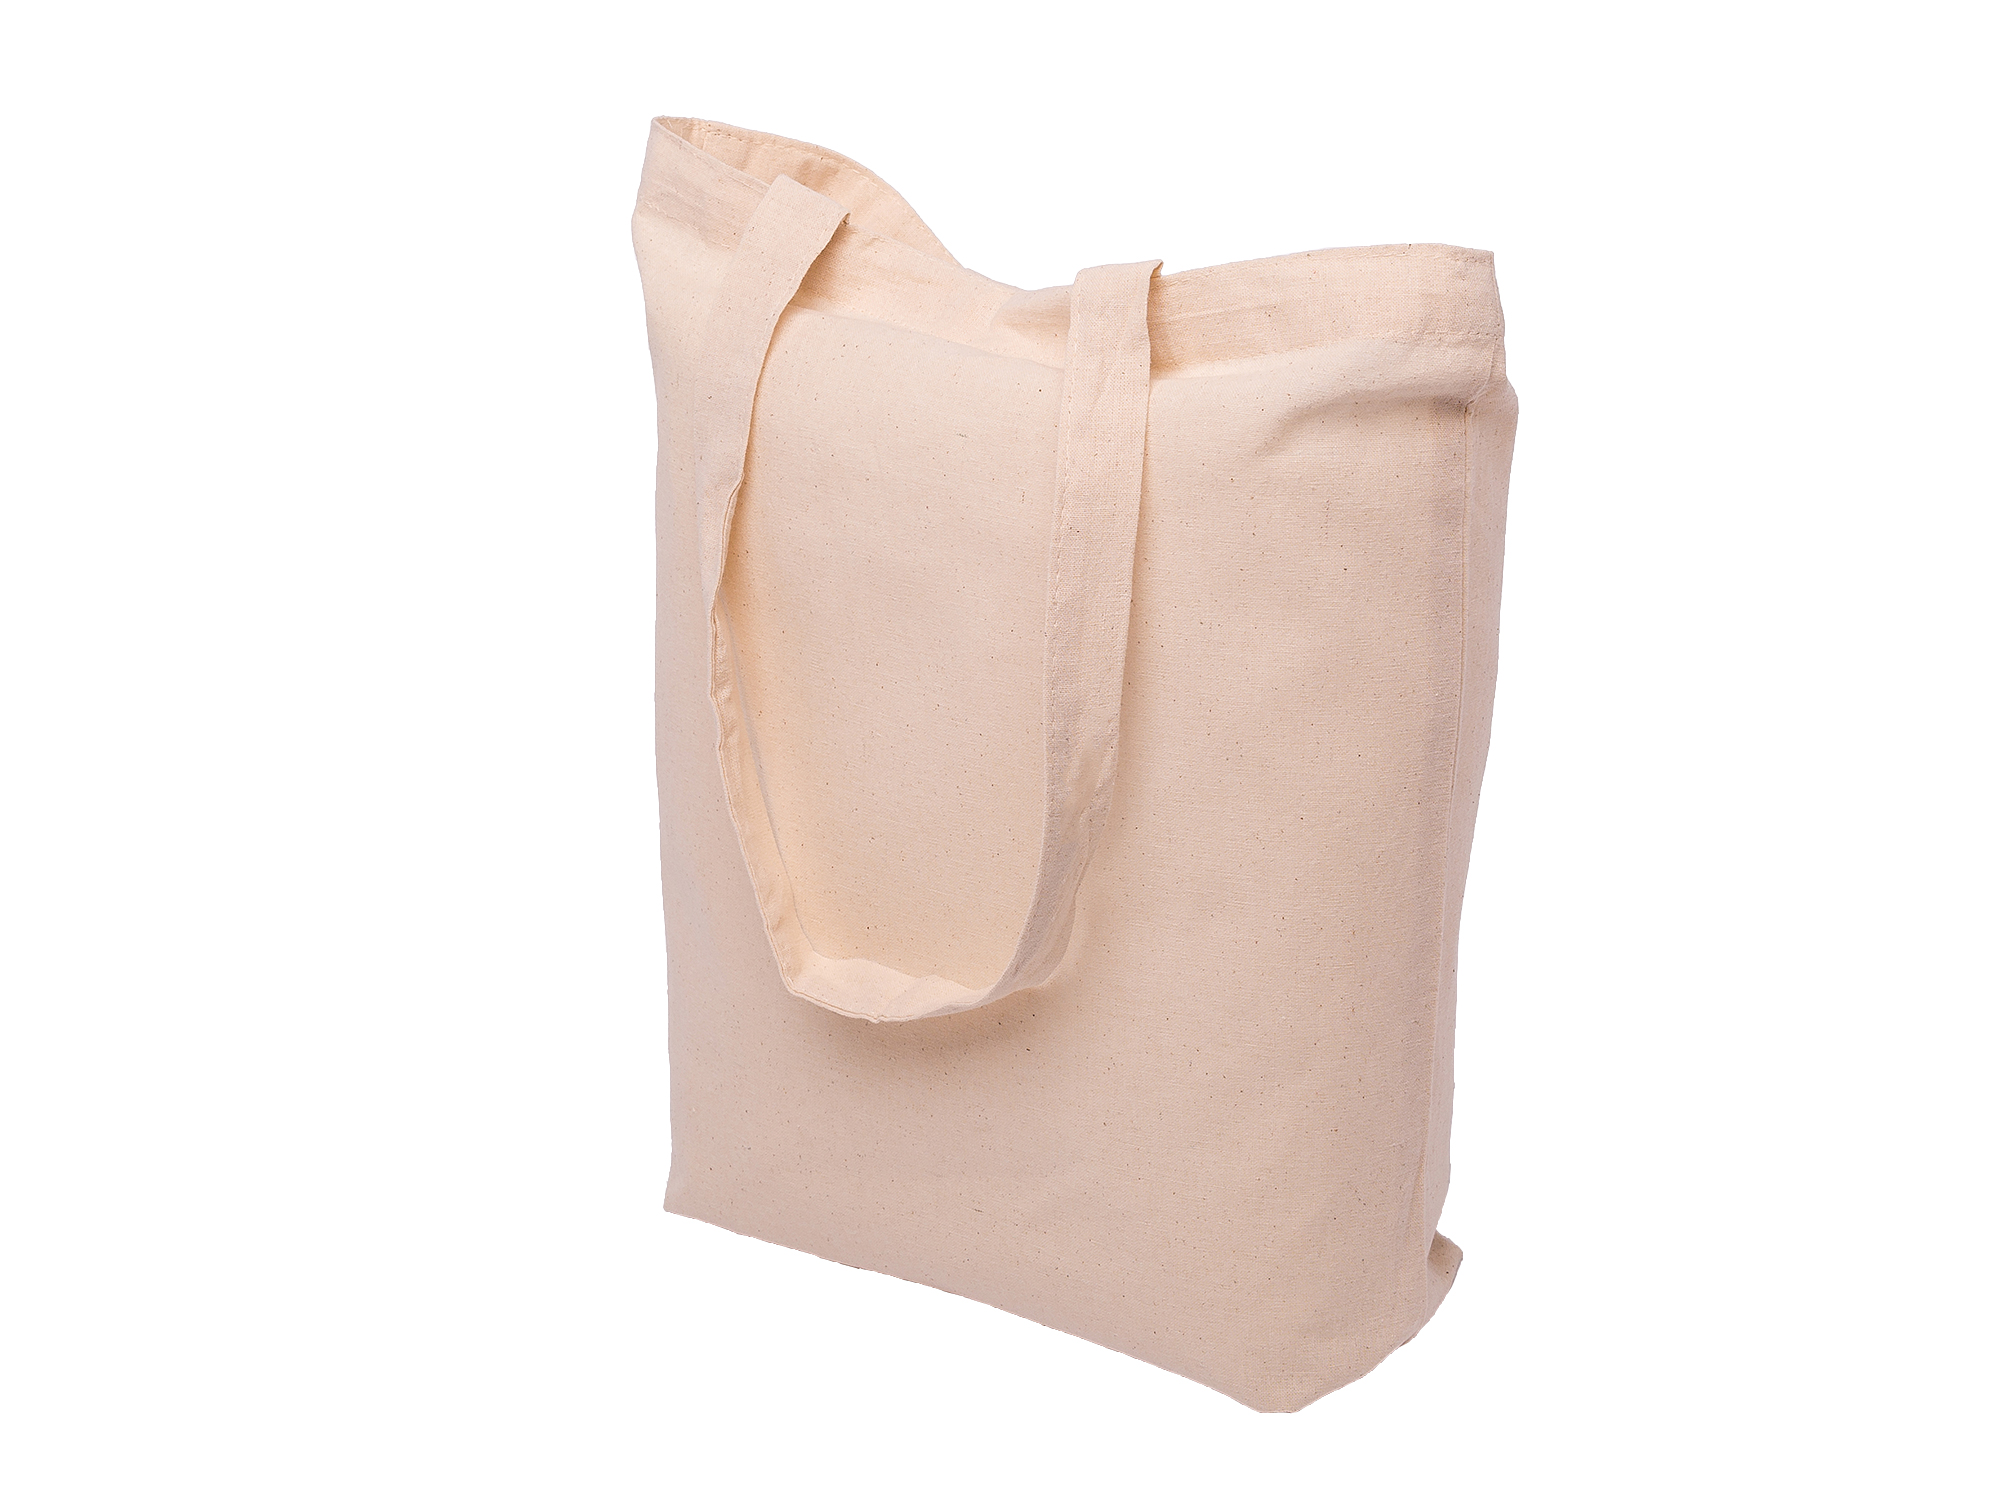 Item COTTON BAG for shopping ECRU ECO environmental